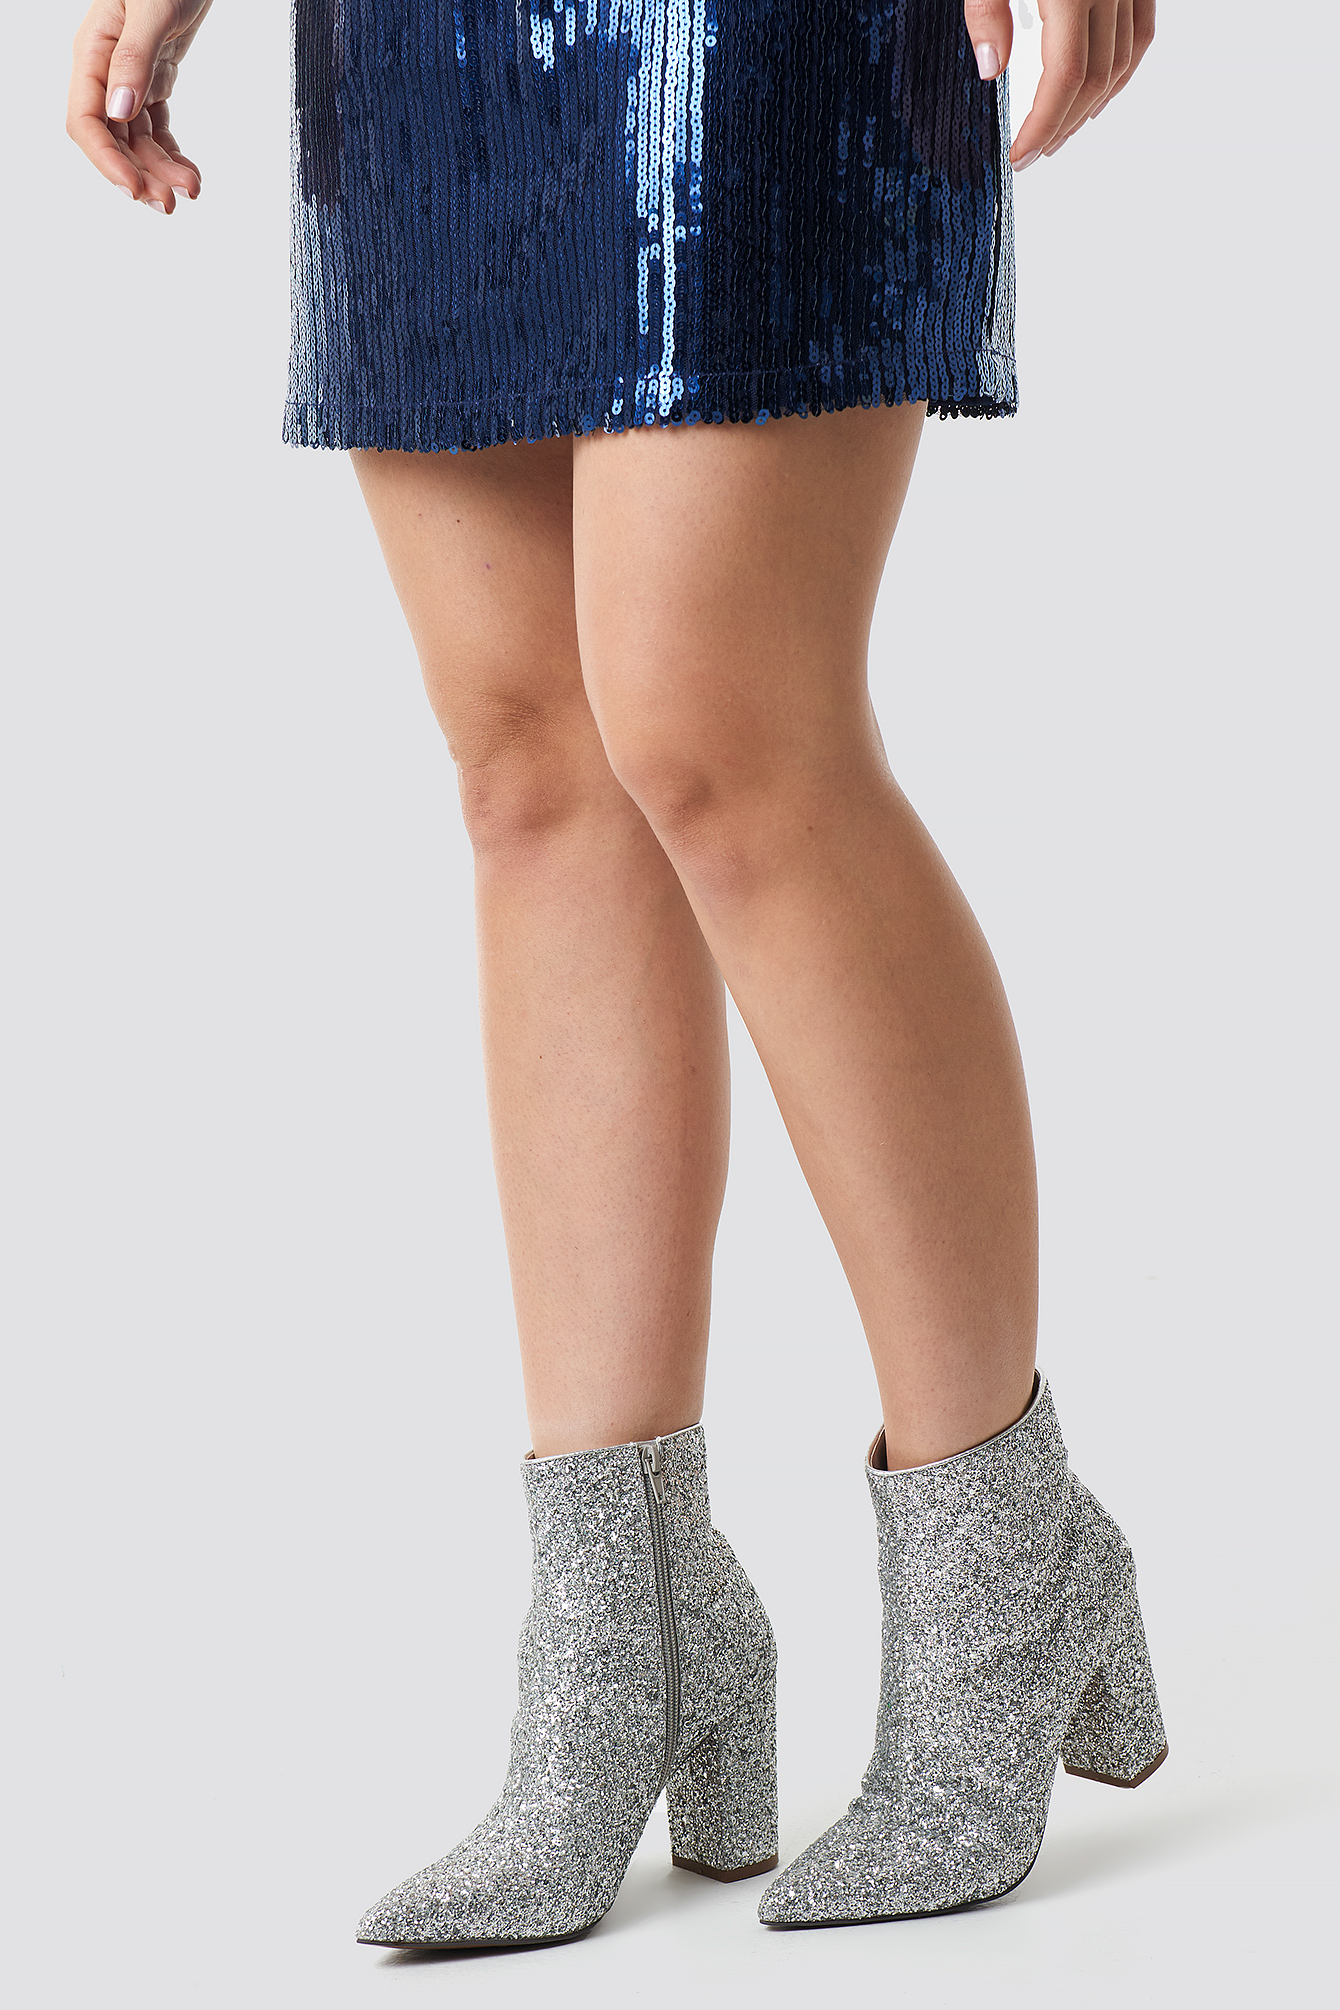 linn ahlborg x na-kd -  Glitter Heel Boots - Silver